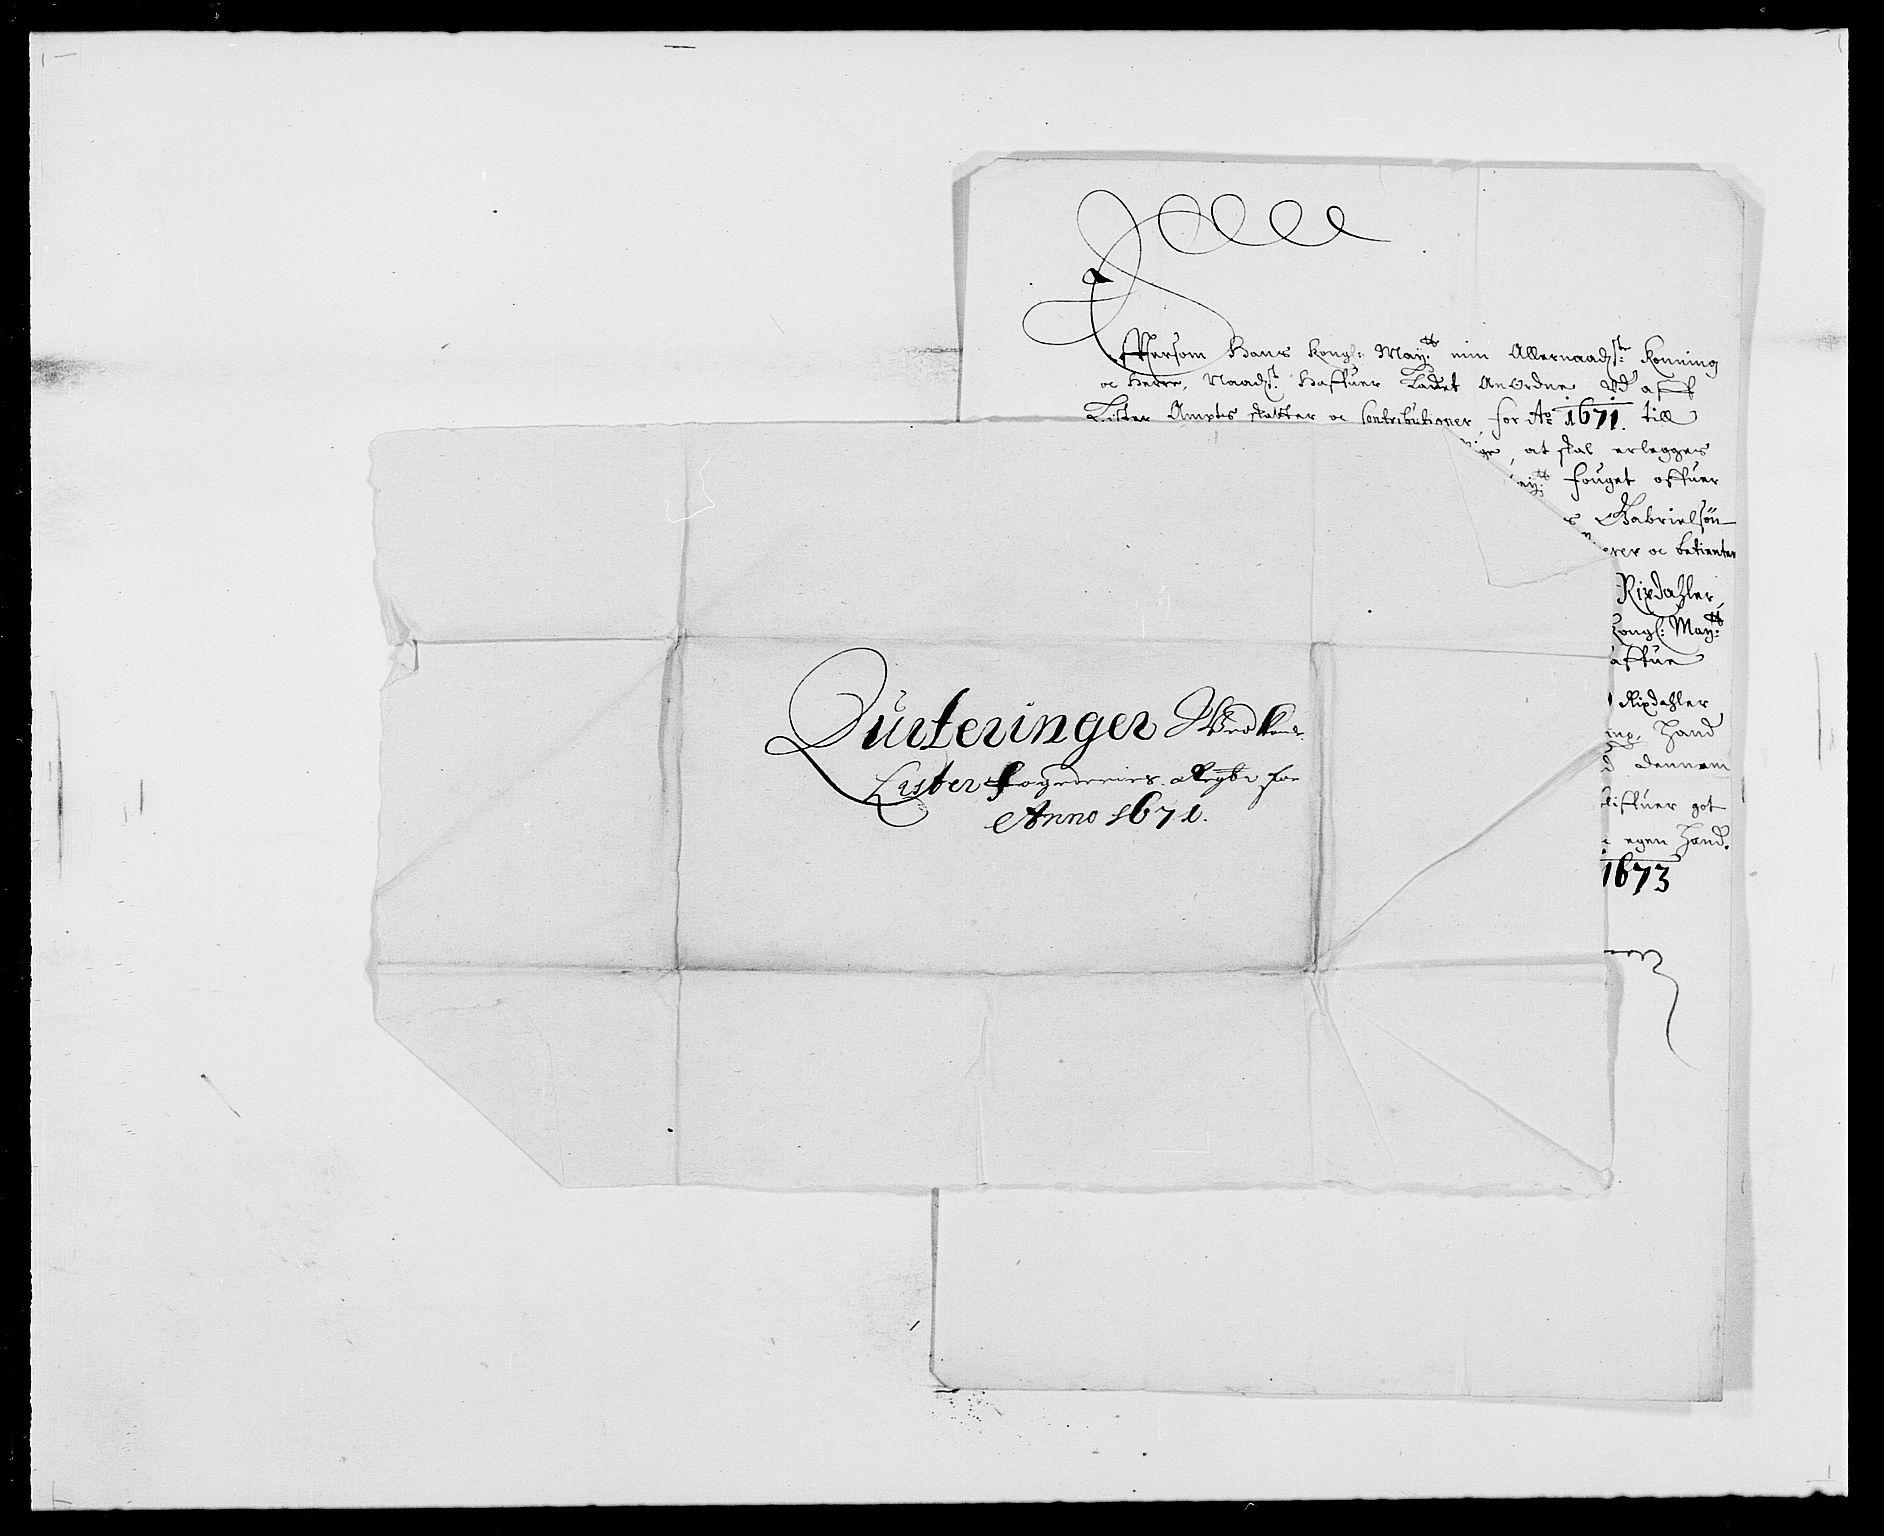 RA, Rentekammeret inntil 1814, Reviderte regnskaper, Fogderegnskap, R41/L2525: Fogderegnskap Lista, 1669-1671, s. 304